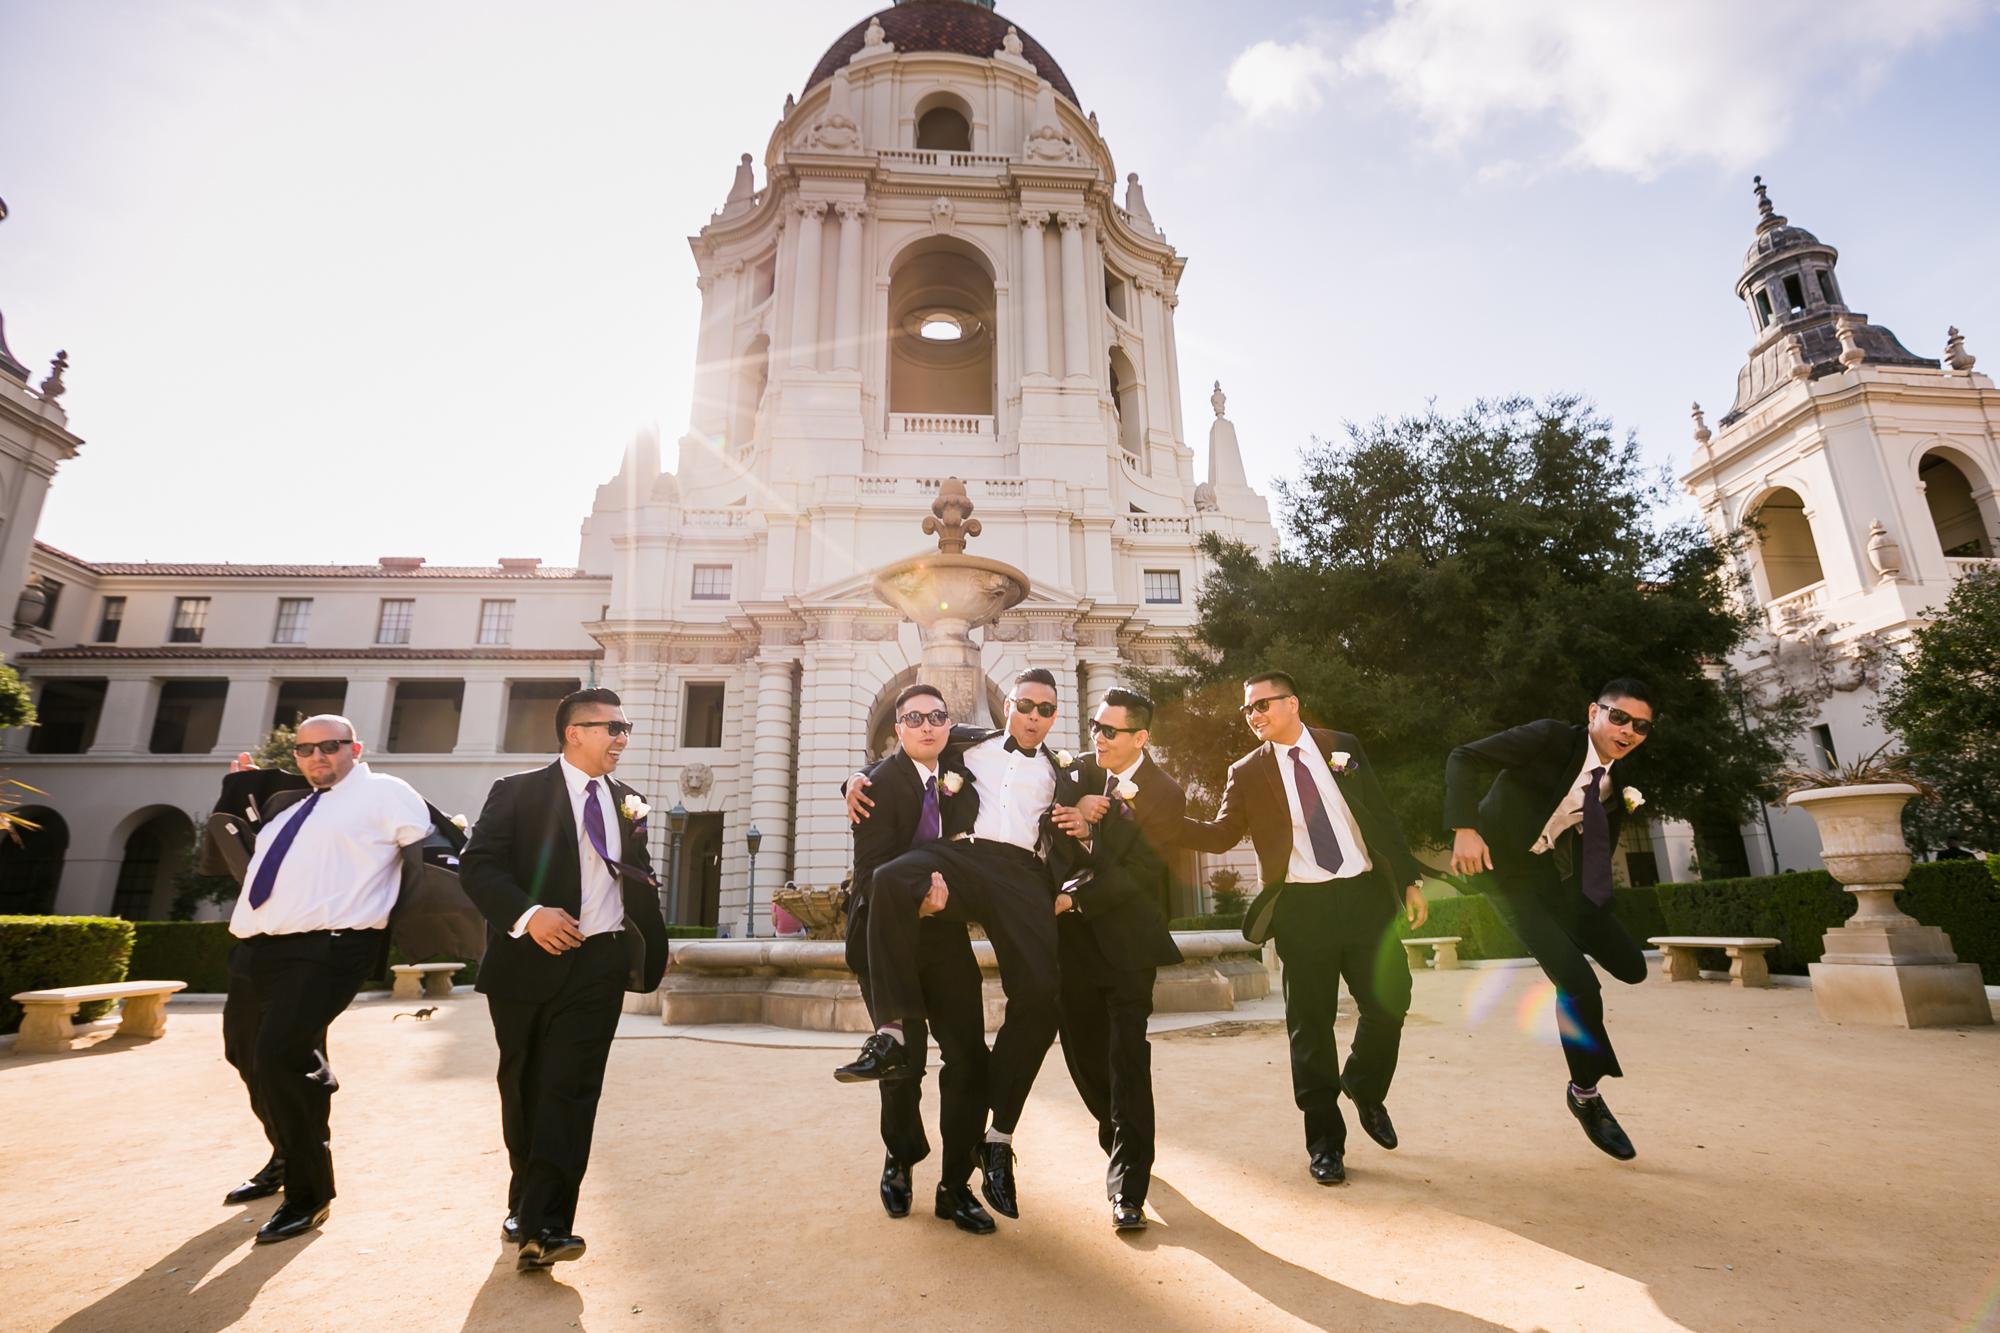 SR-Saint-Andrews-Pasadena-Wedding-0013.jpg